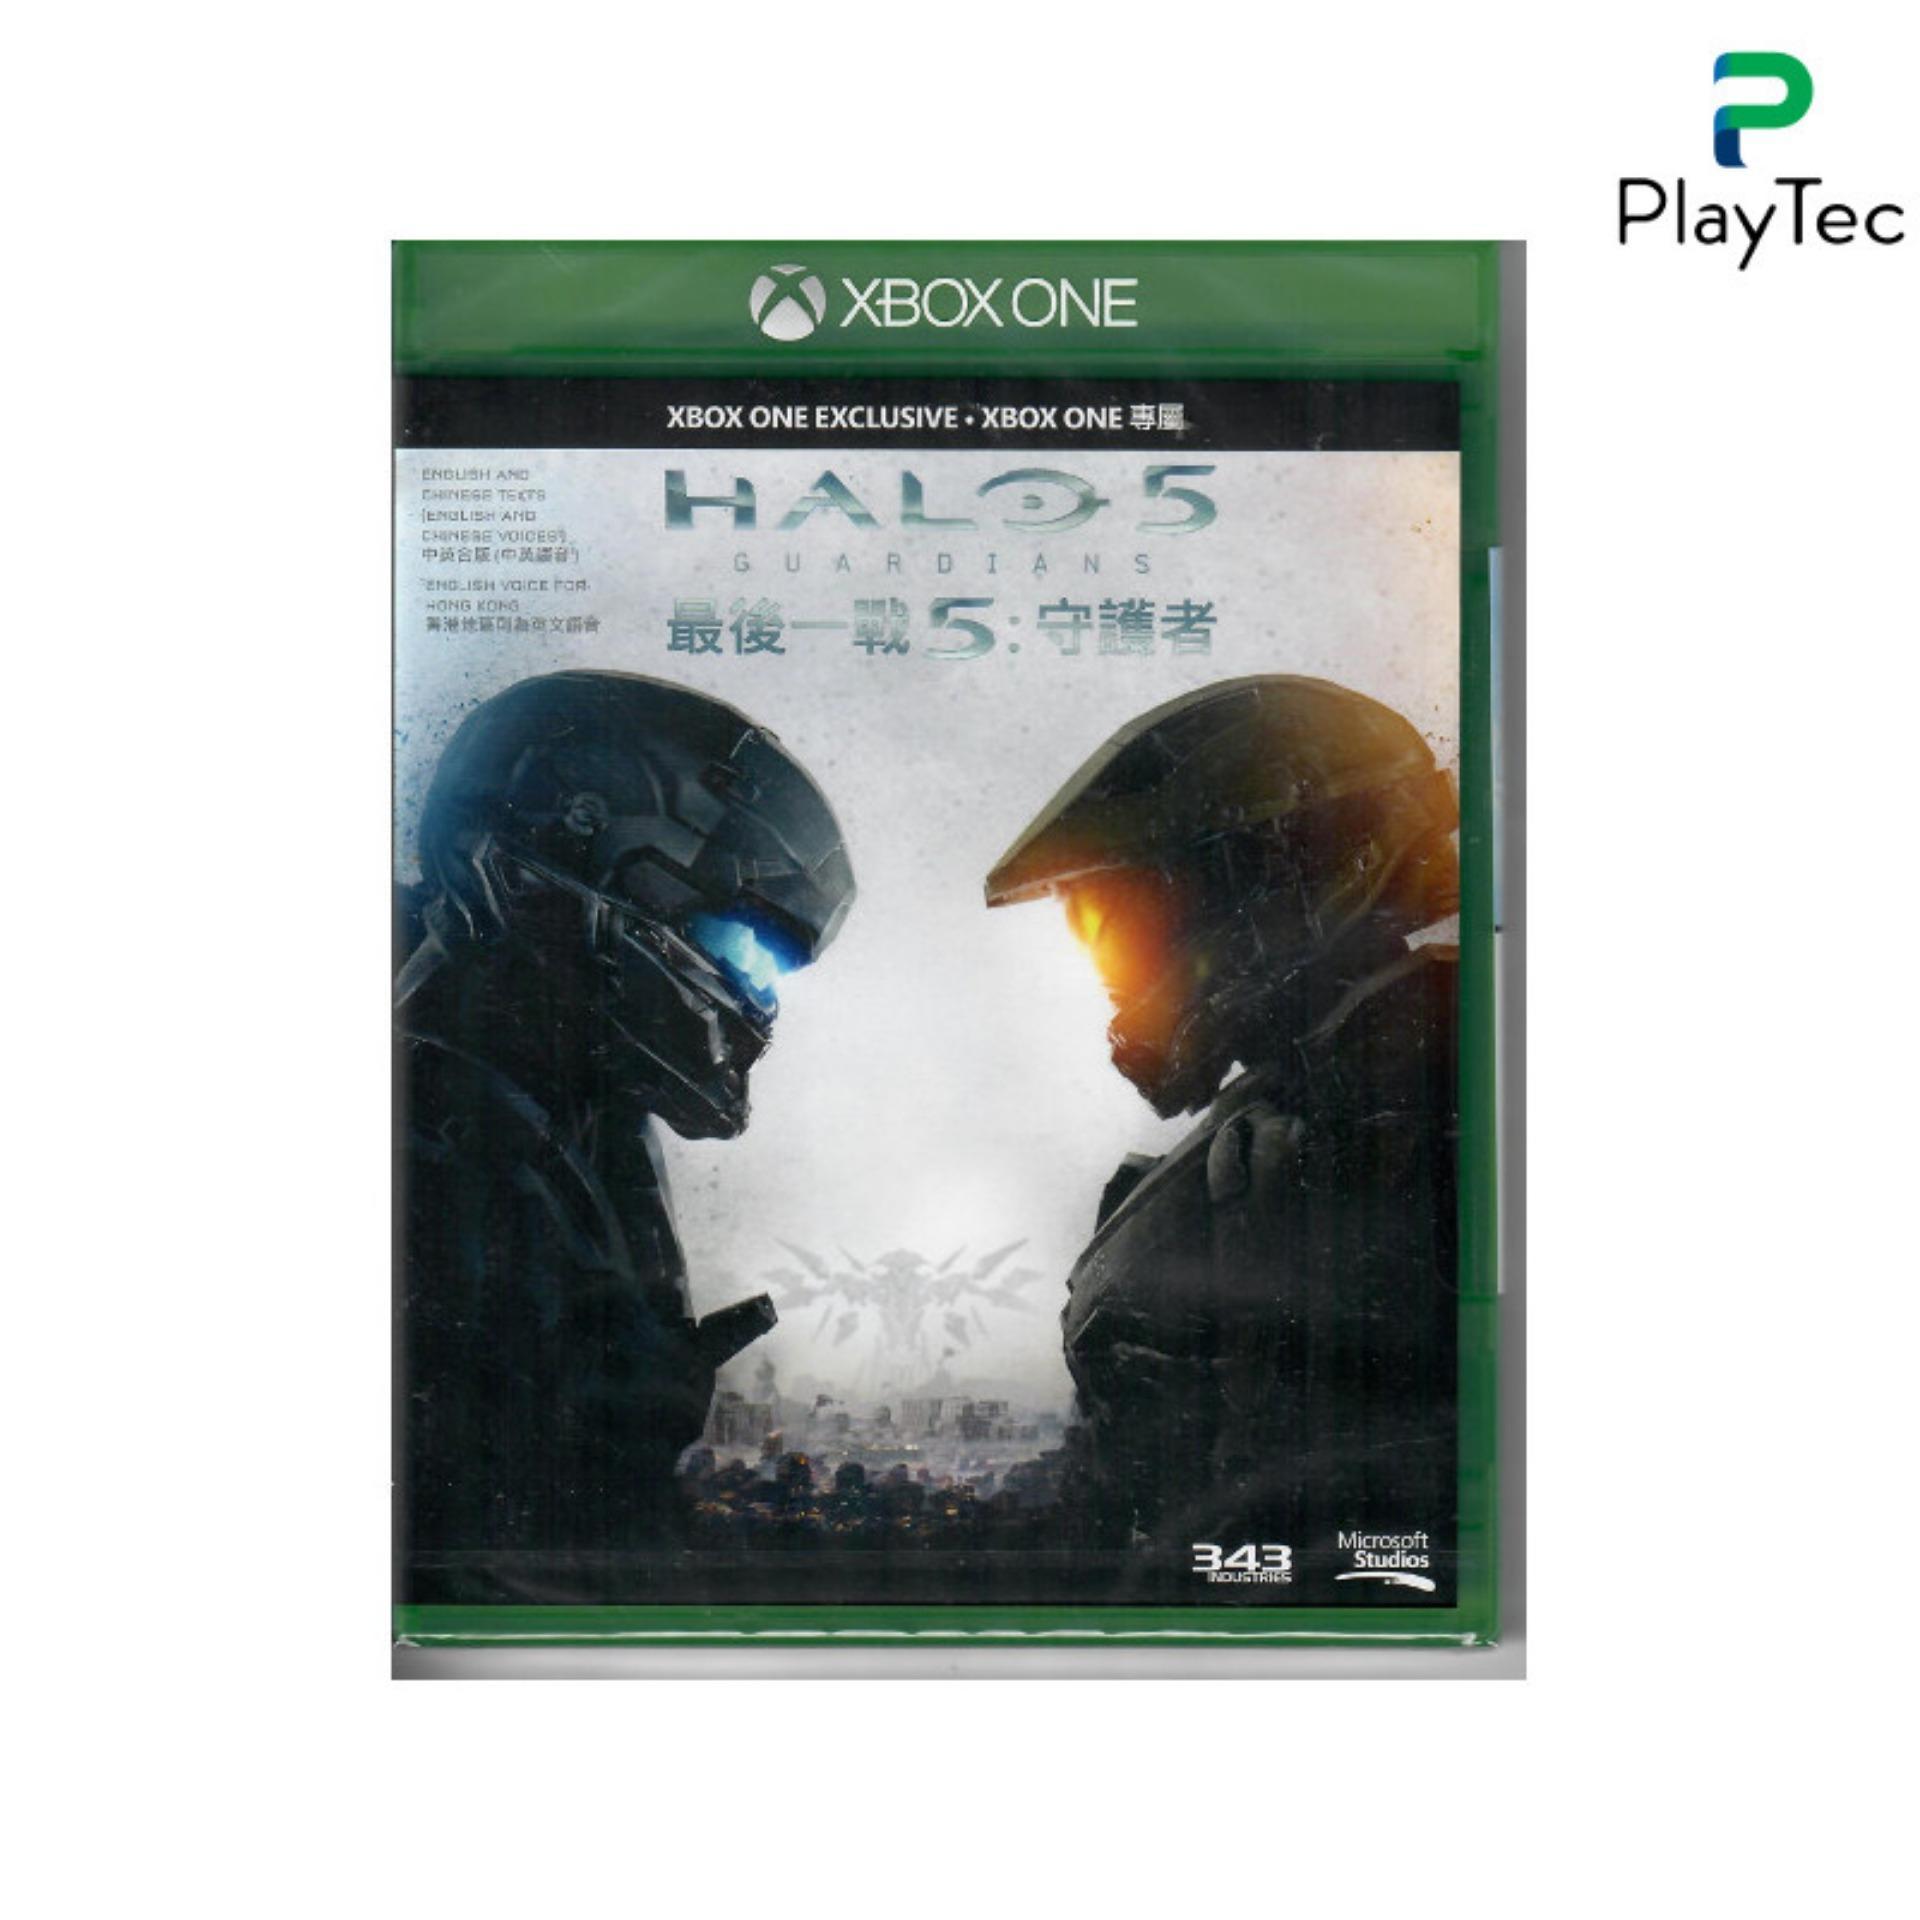 XBOX One Halo 5: Guardians (R3)